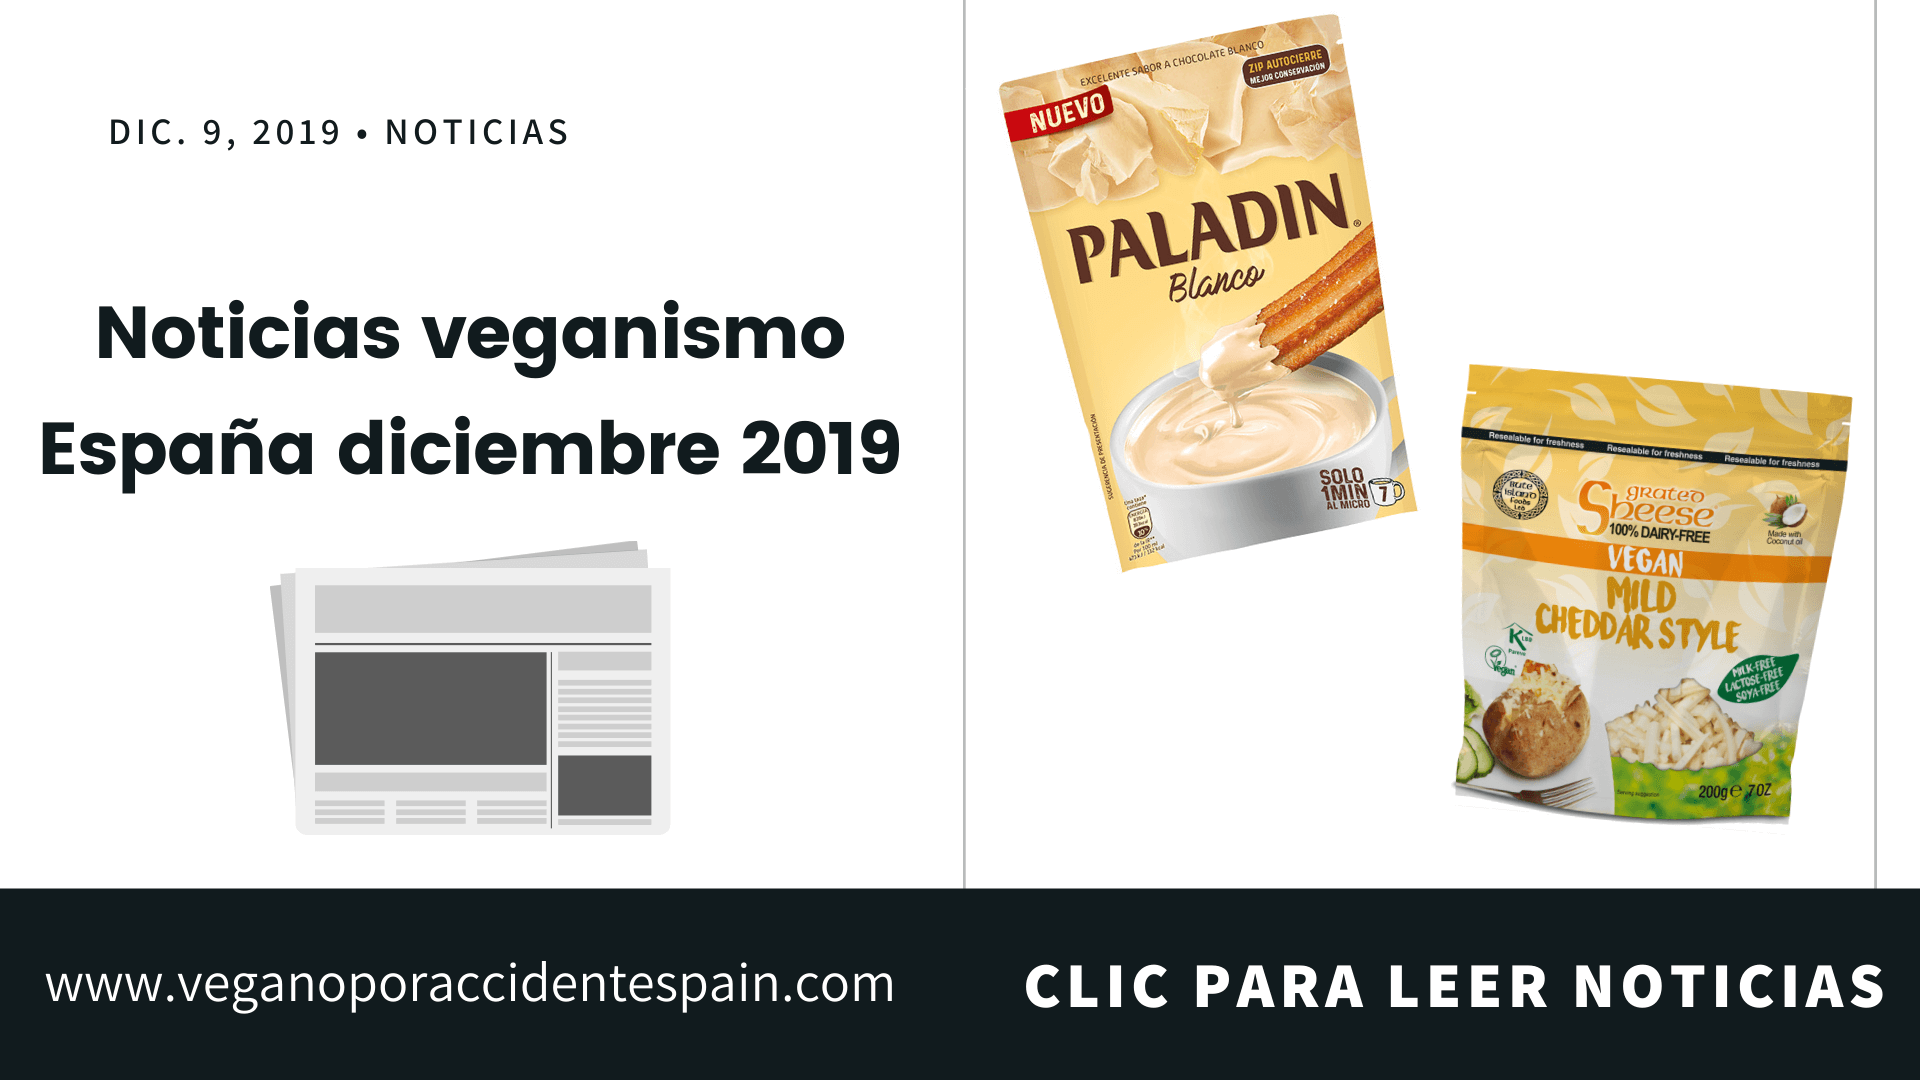 Noticias veganismo España enero 2020: Resumen